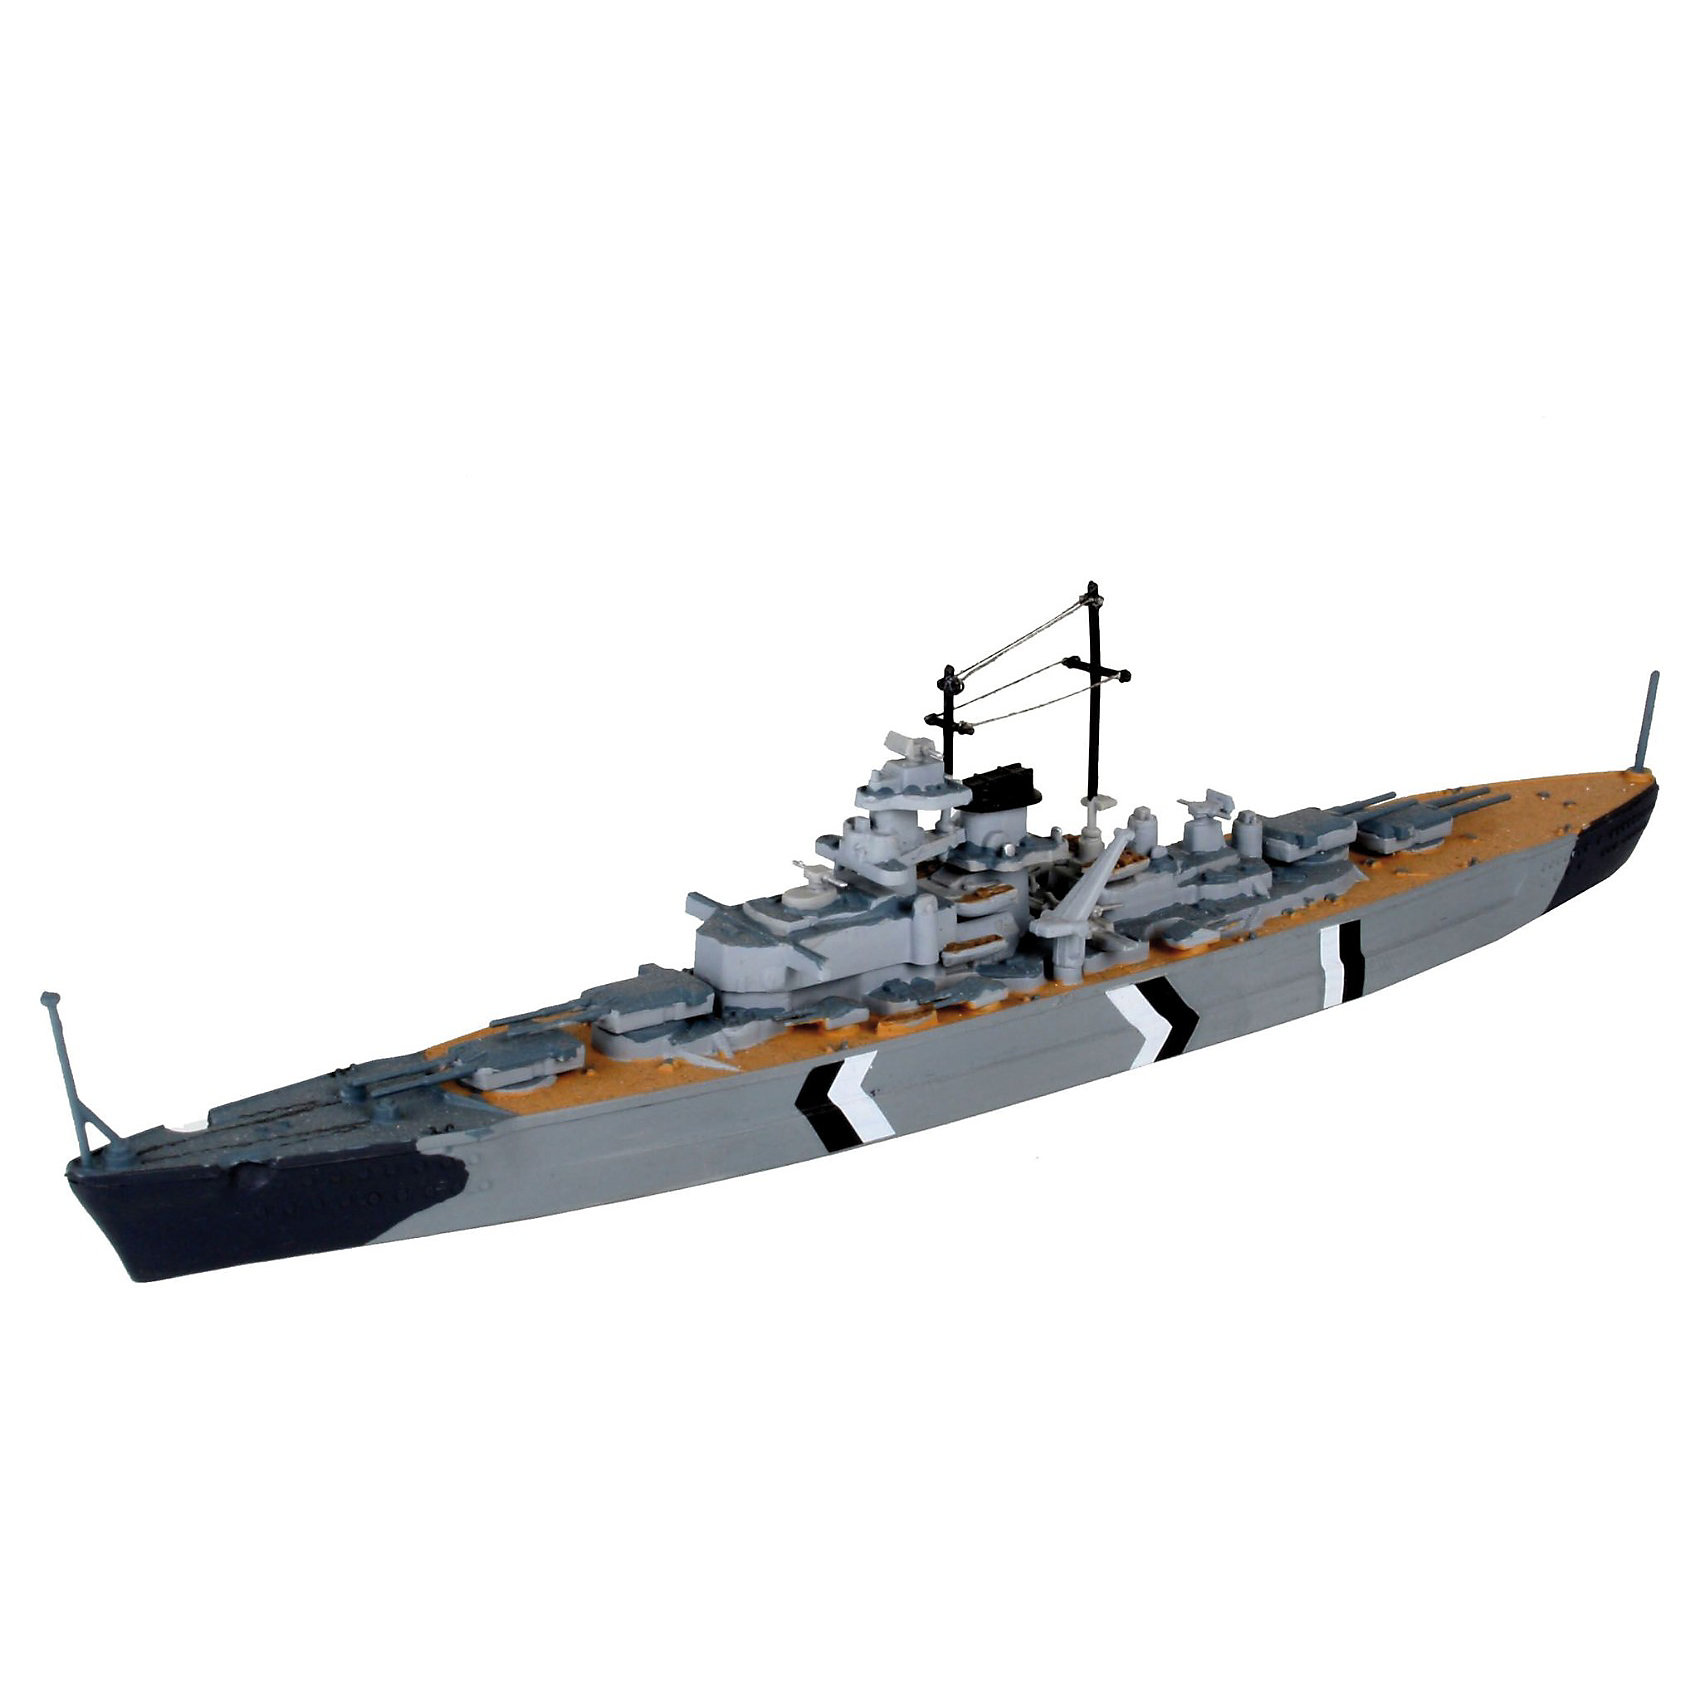 цены Revell Корабль Линкор «Бисмарк», Revell